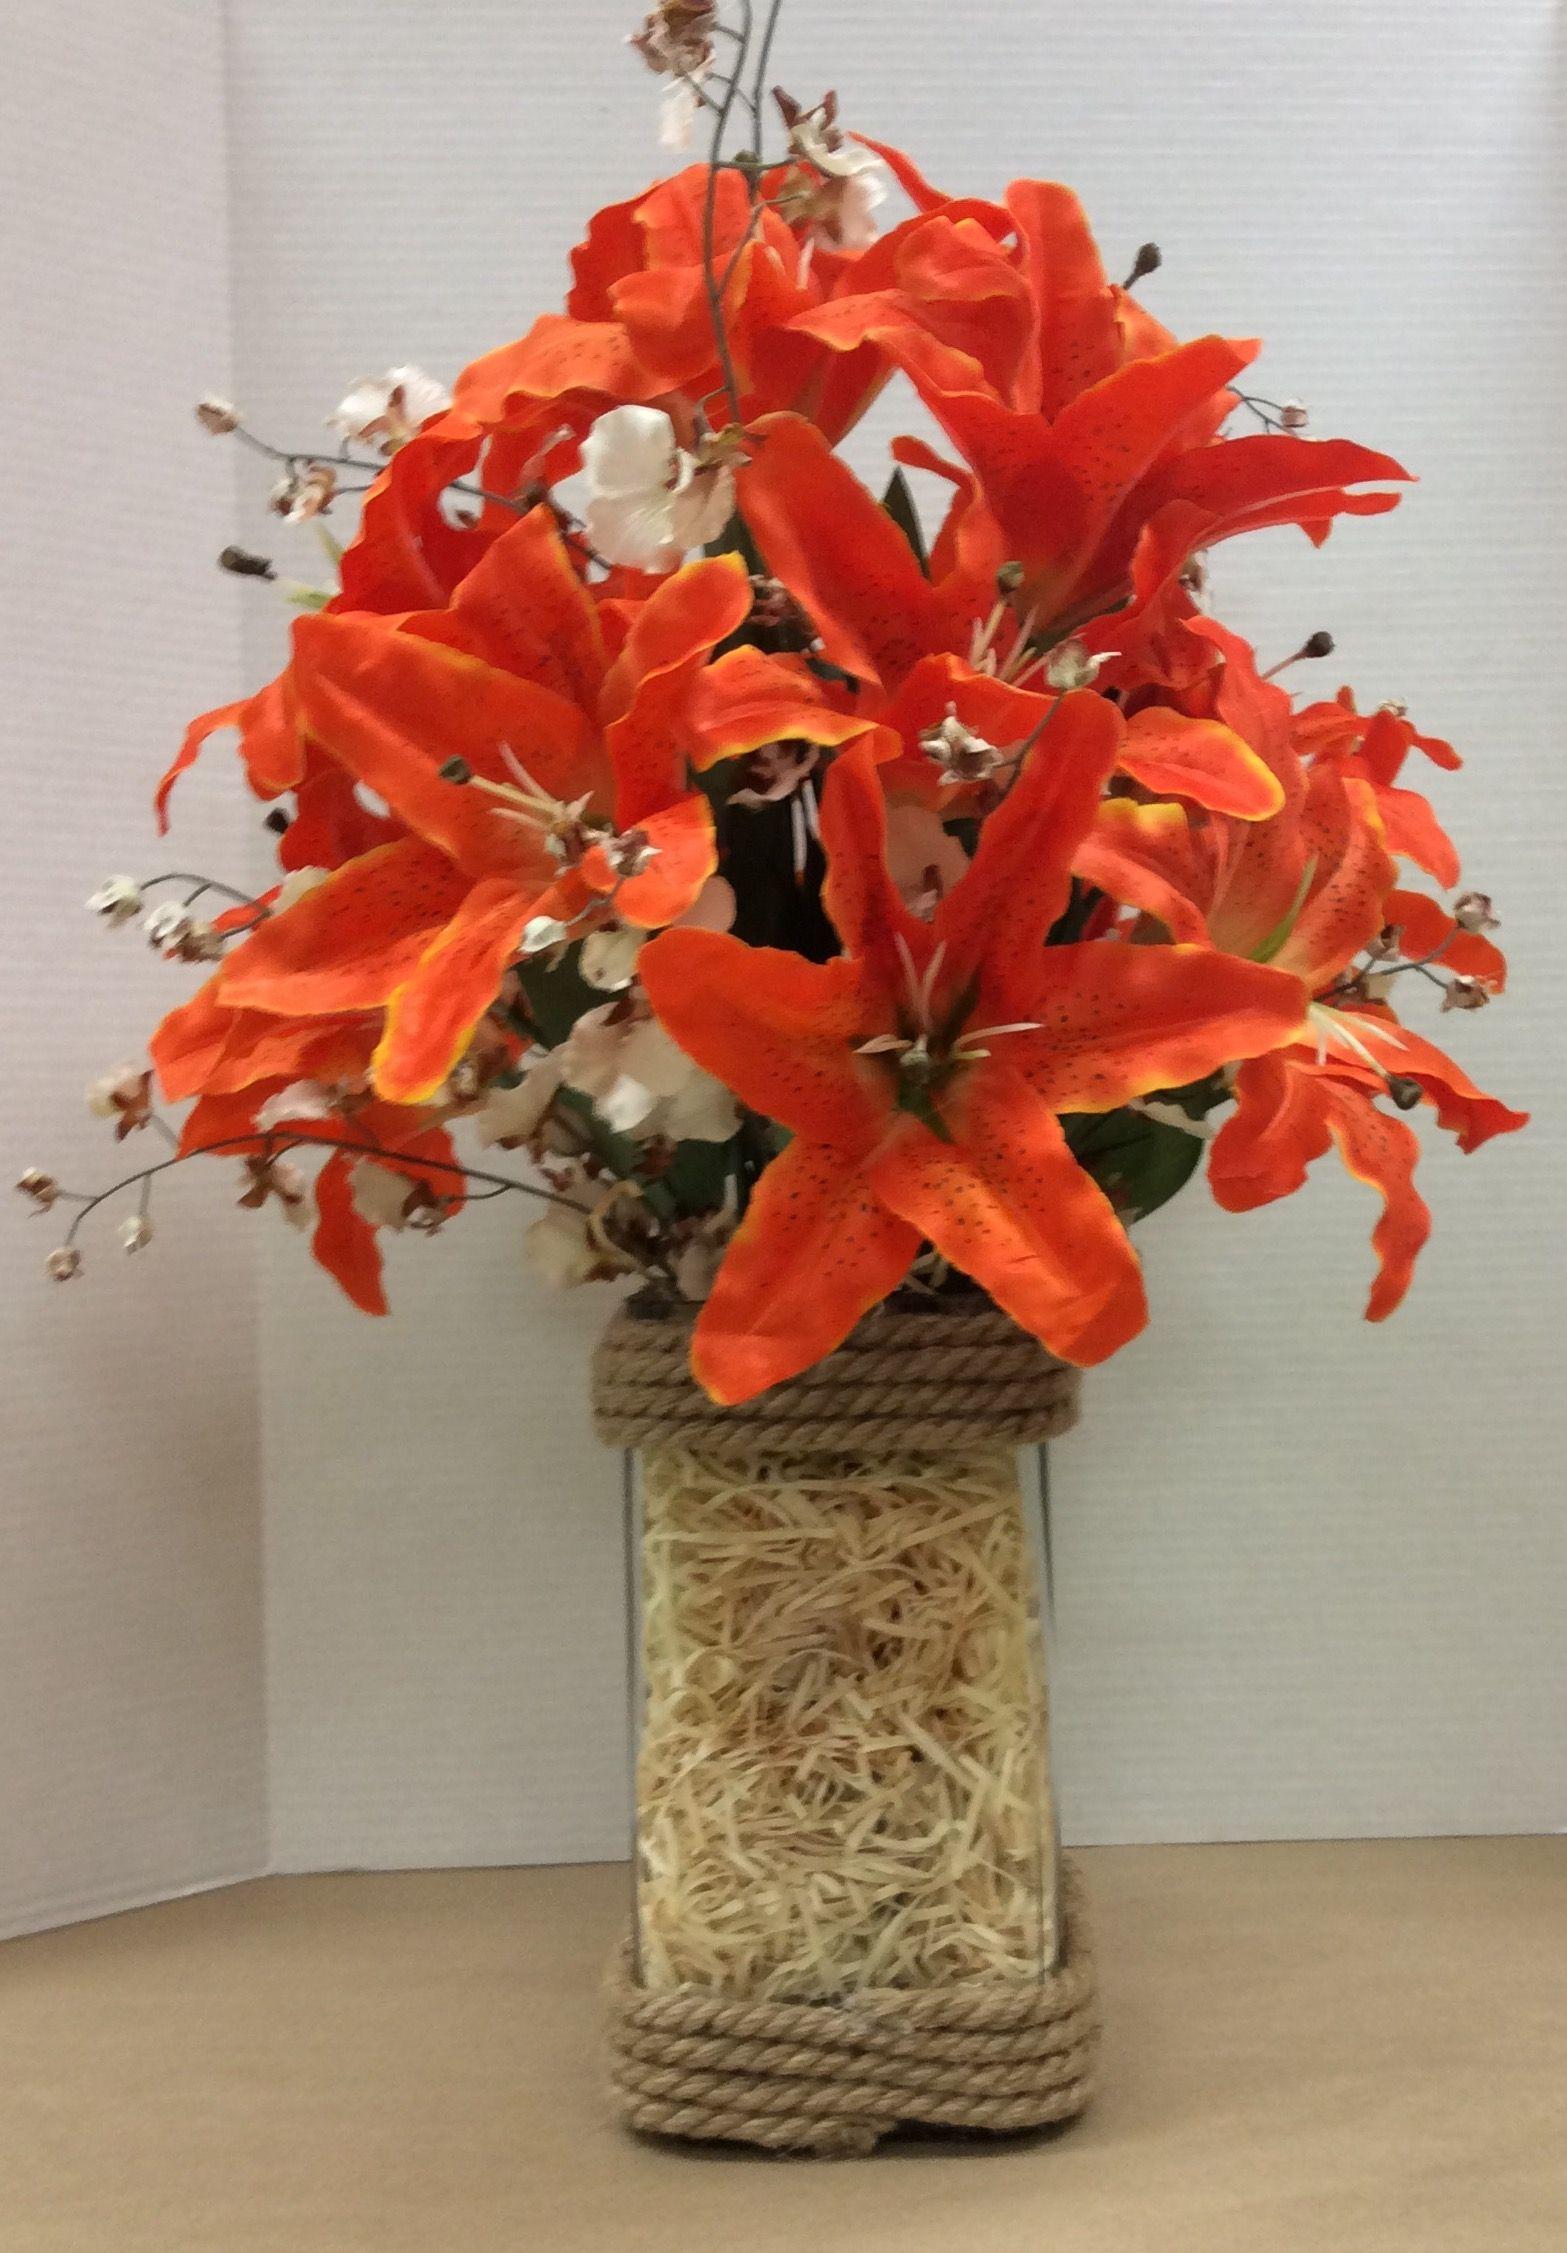 Floral Design I Made Using Glass Vase With Jute Glued To Top And Bottom Glued Styrofoam Inside Added Excelsior To Cover Foam Floral Floral Design Deco Mesh